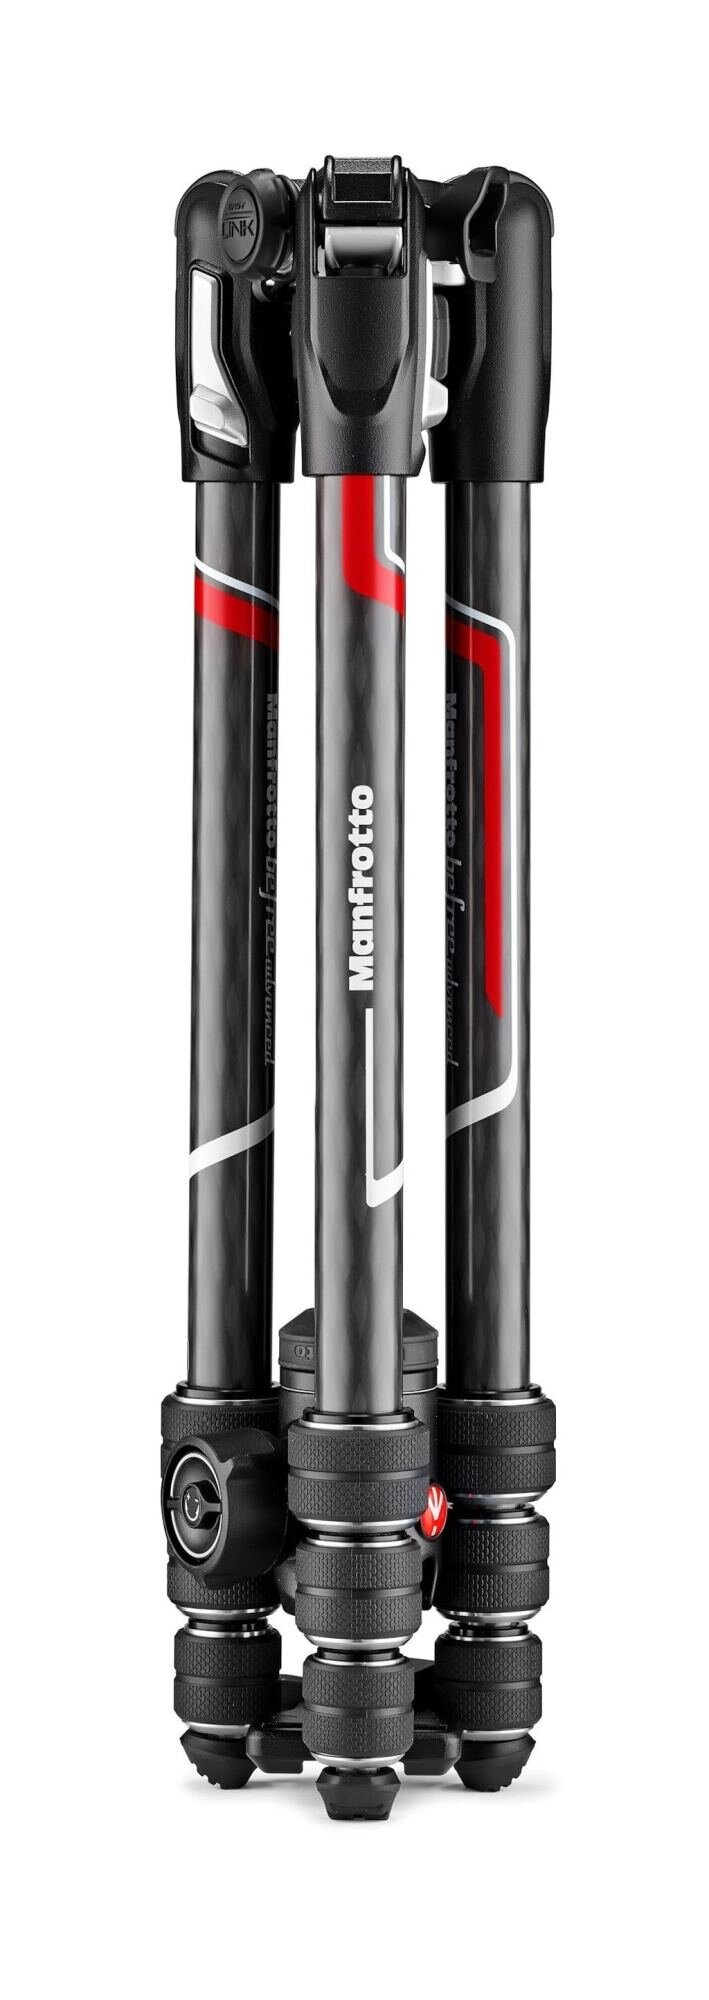 Manfrotto MKBFRTC4-BH Befree Advanced Carbon Twist